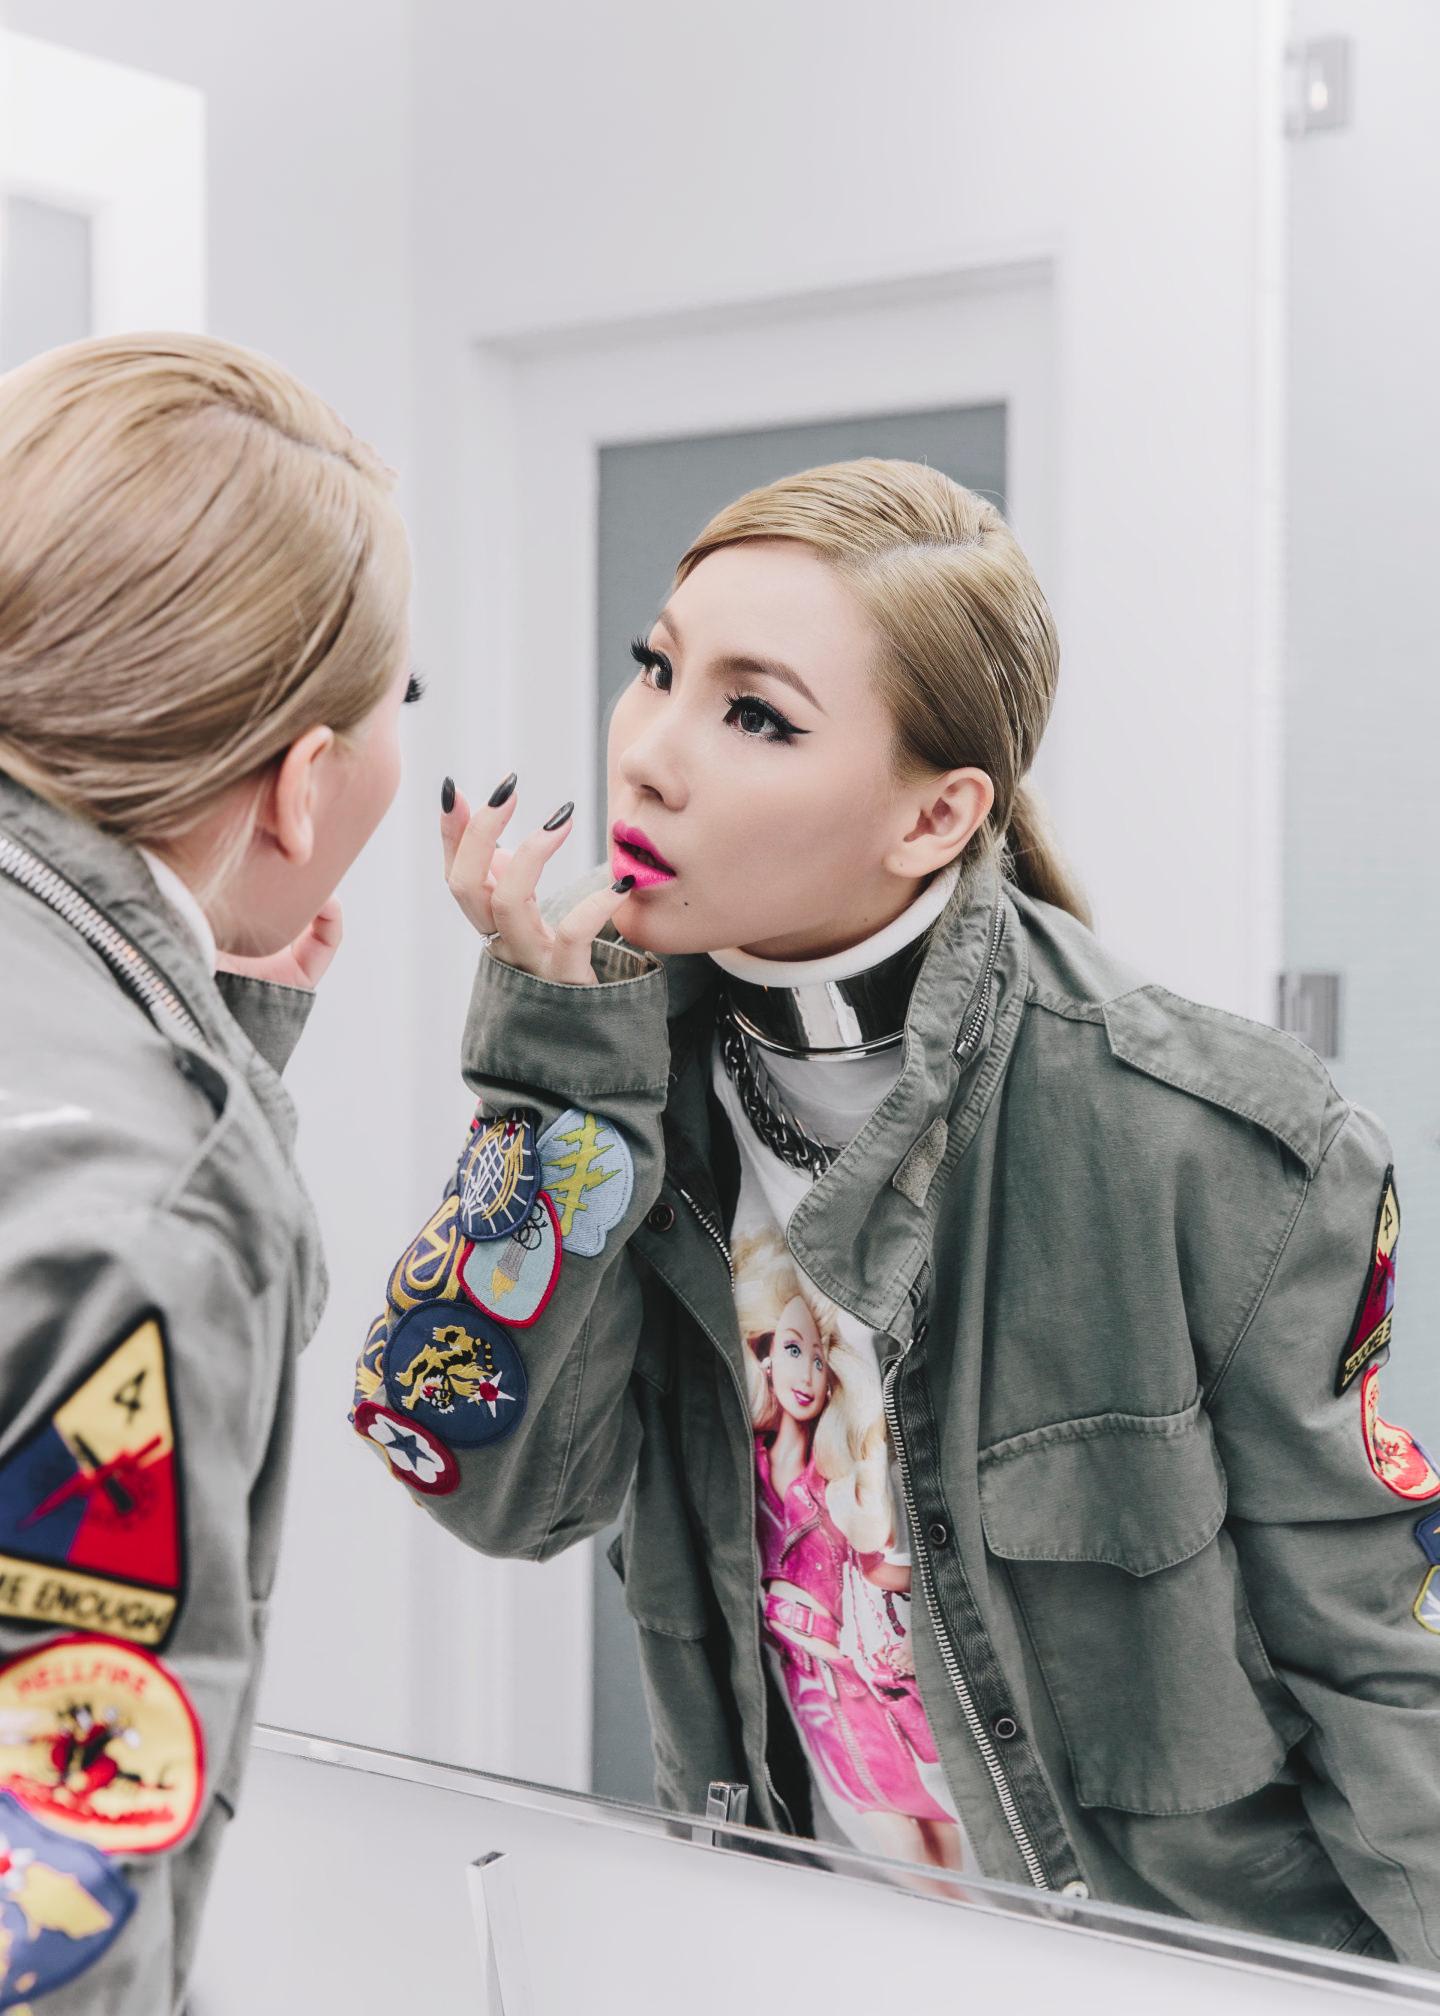 CL 2NE1 interview make-up